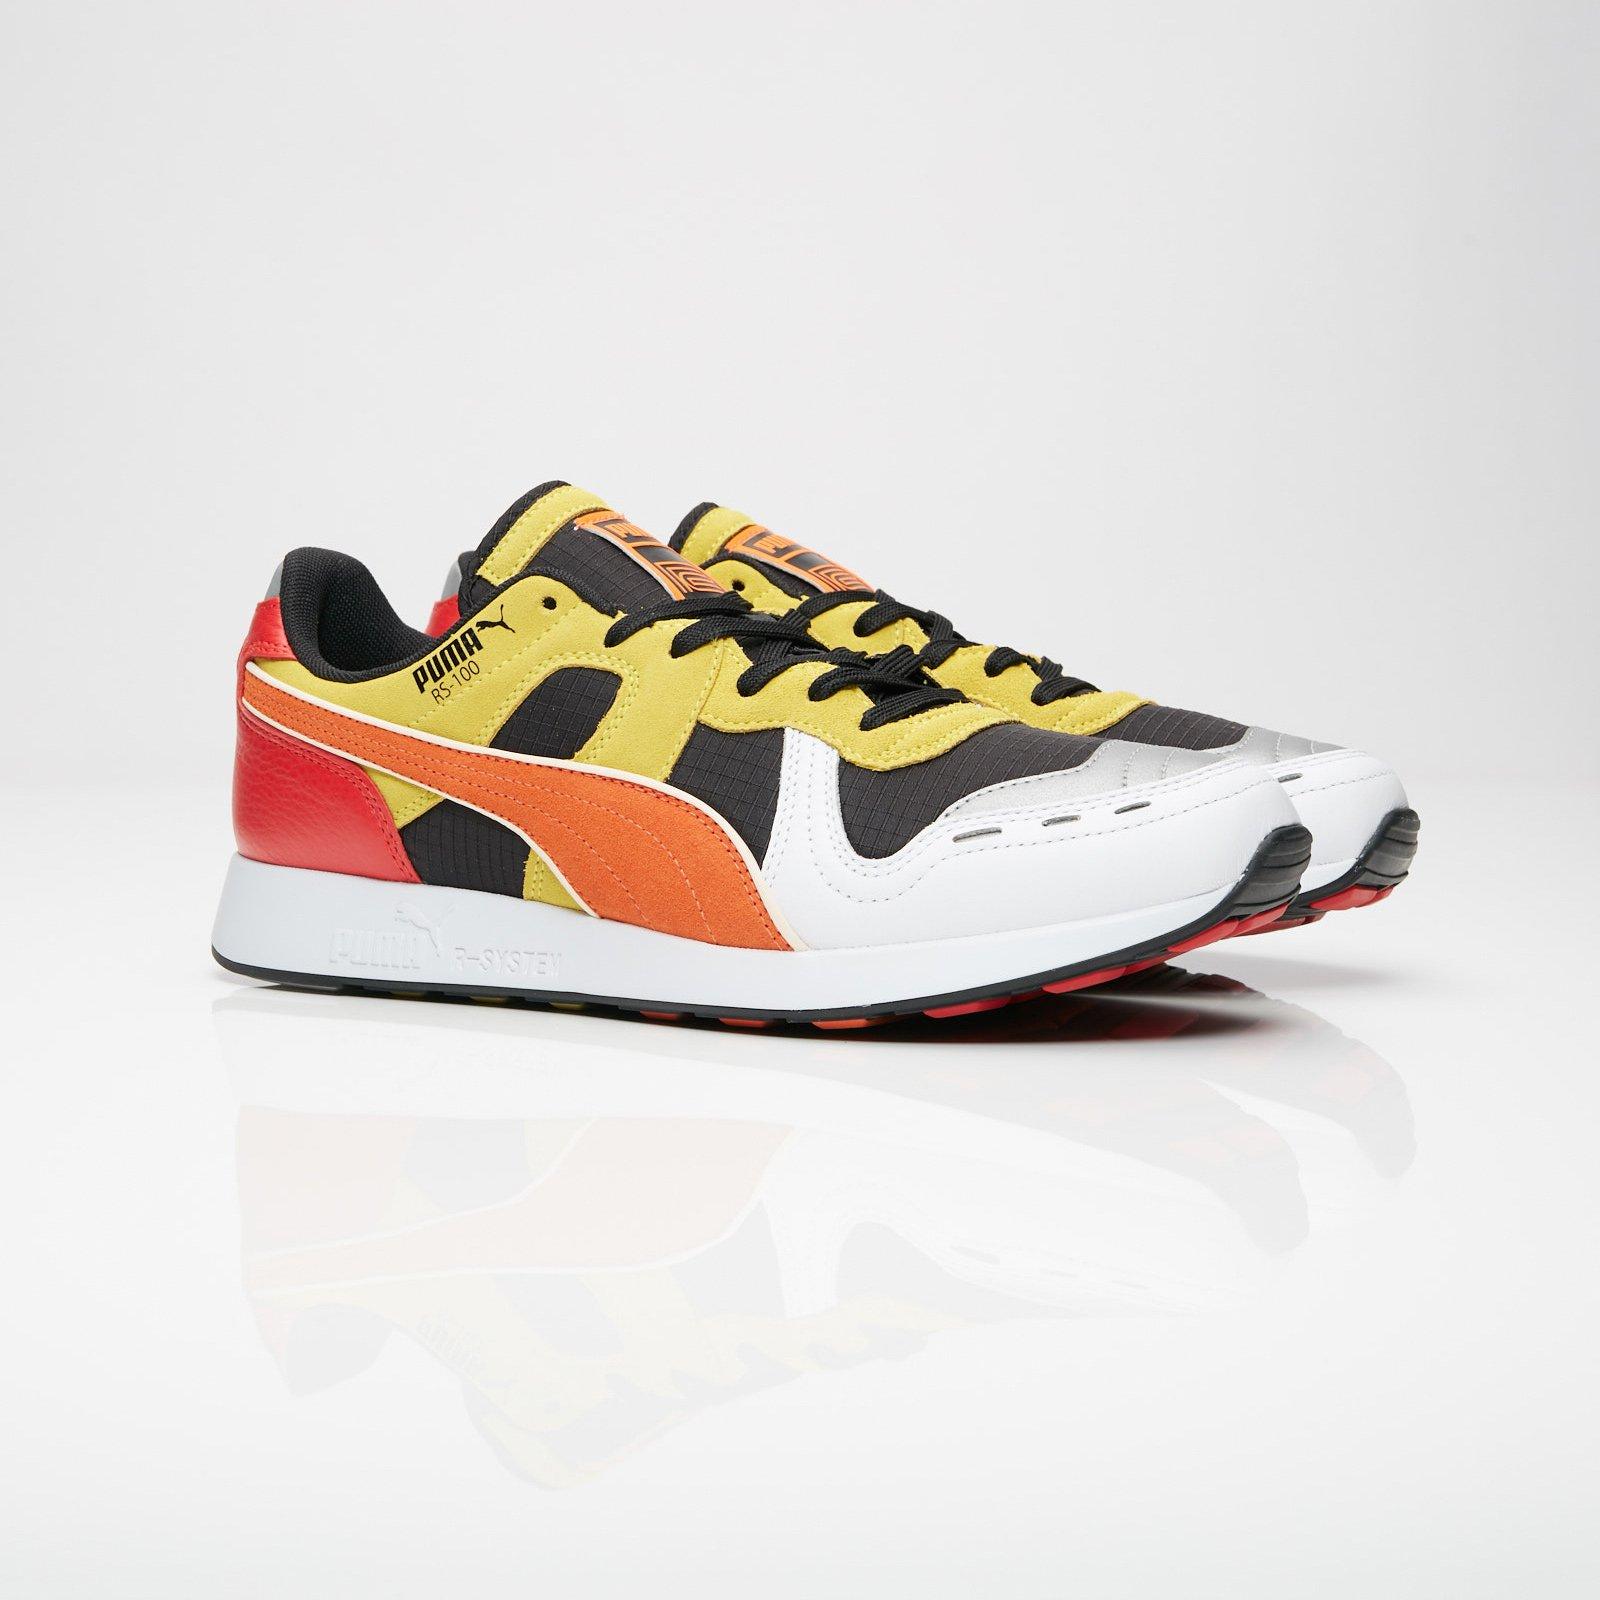 Puma RS-100 x Roland - 368405-01 - Sneakersnstuff  8f6a6a6a8